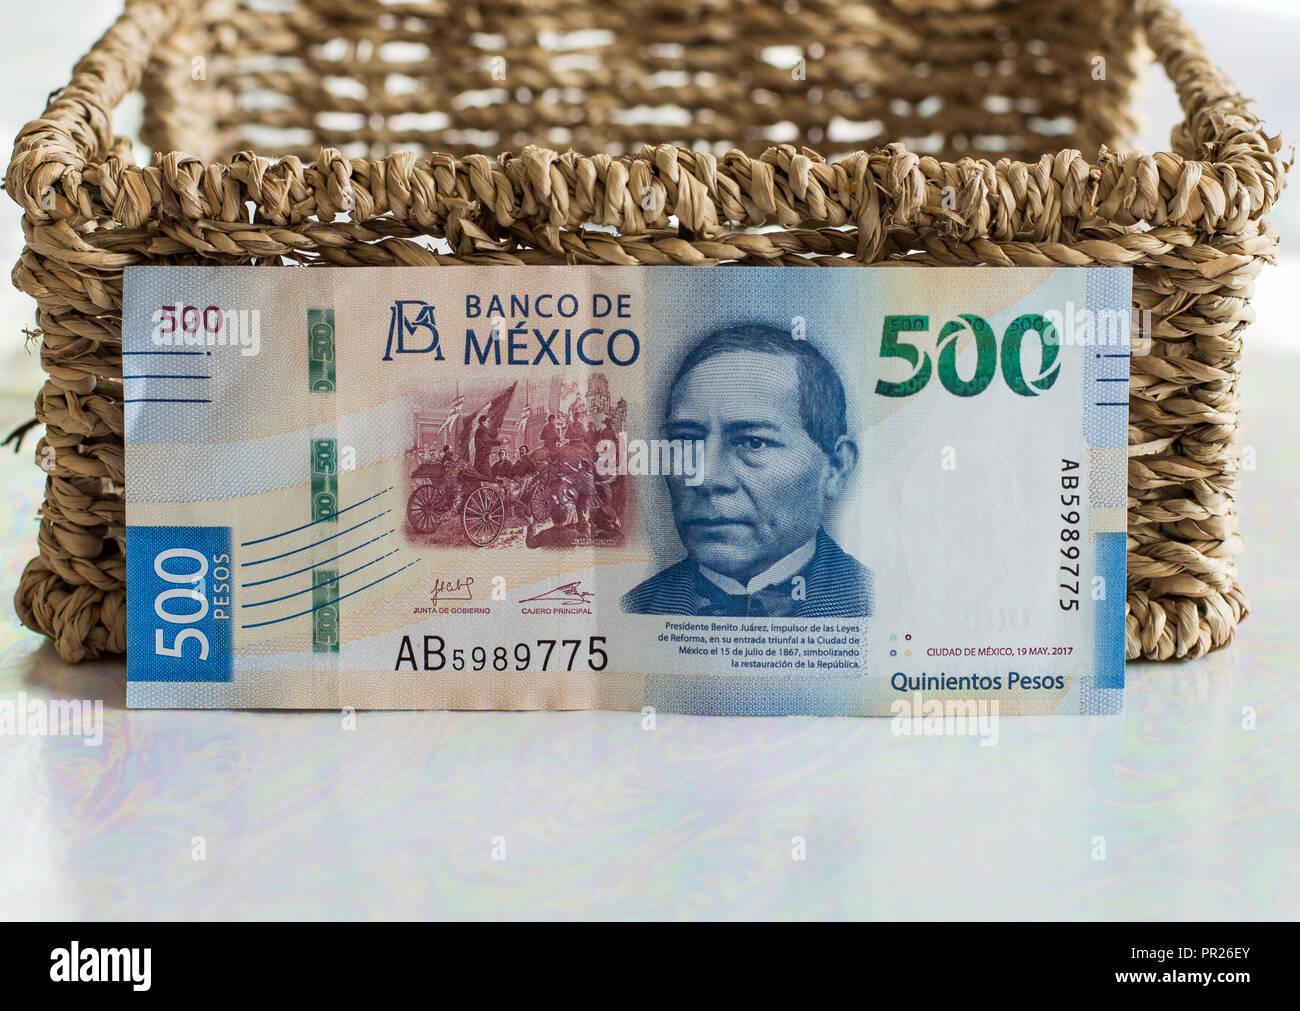 Mexican Economy Stock Photos & Mexican Economy Stock Images